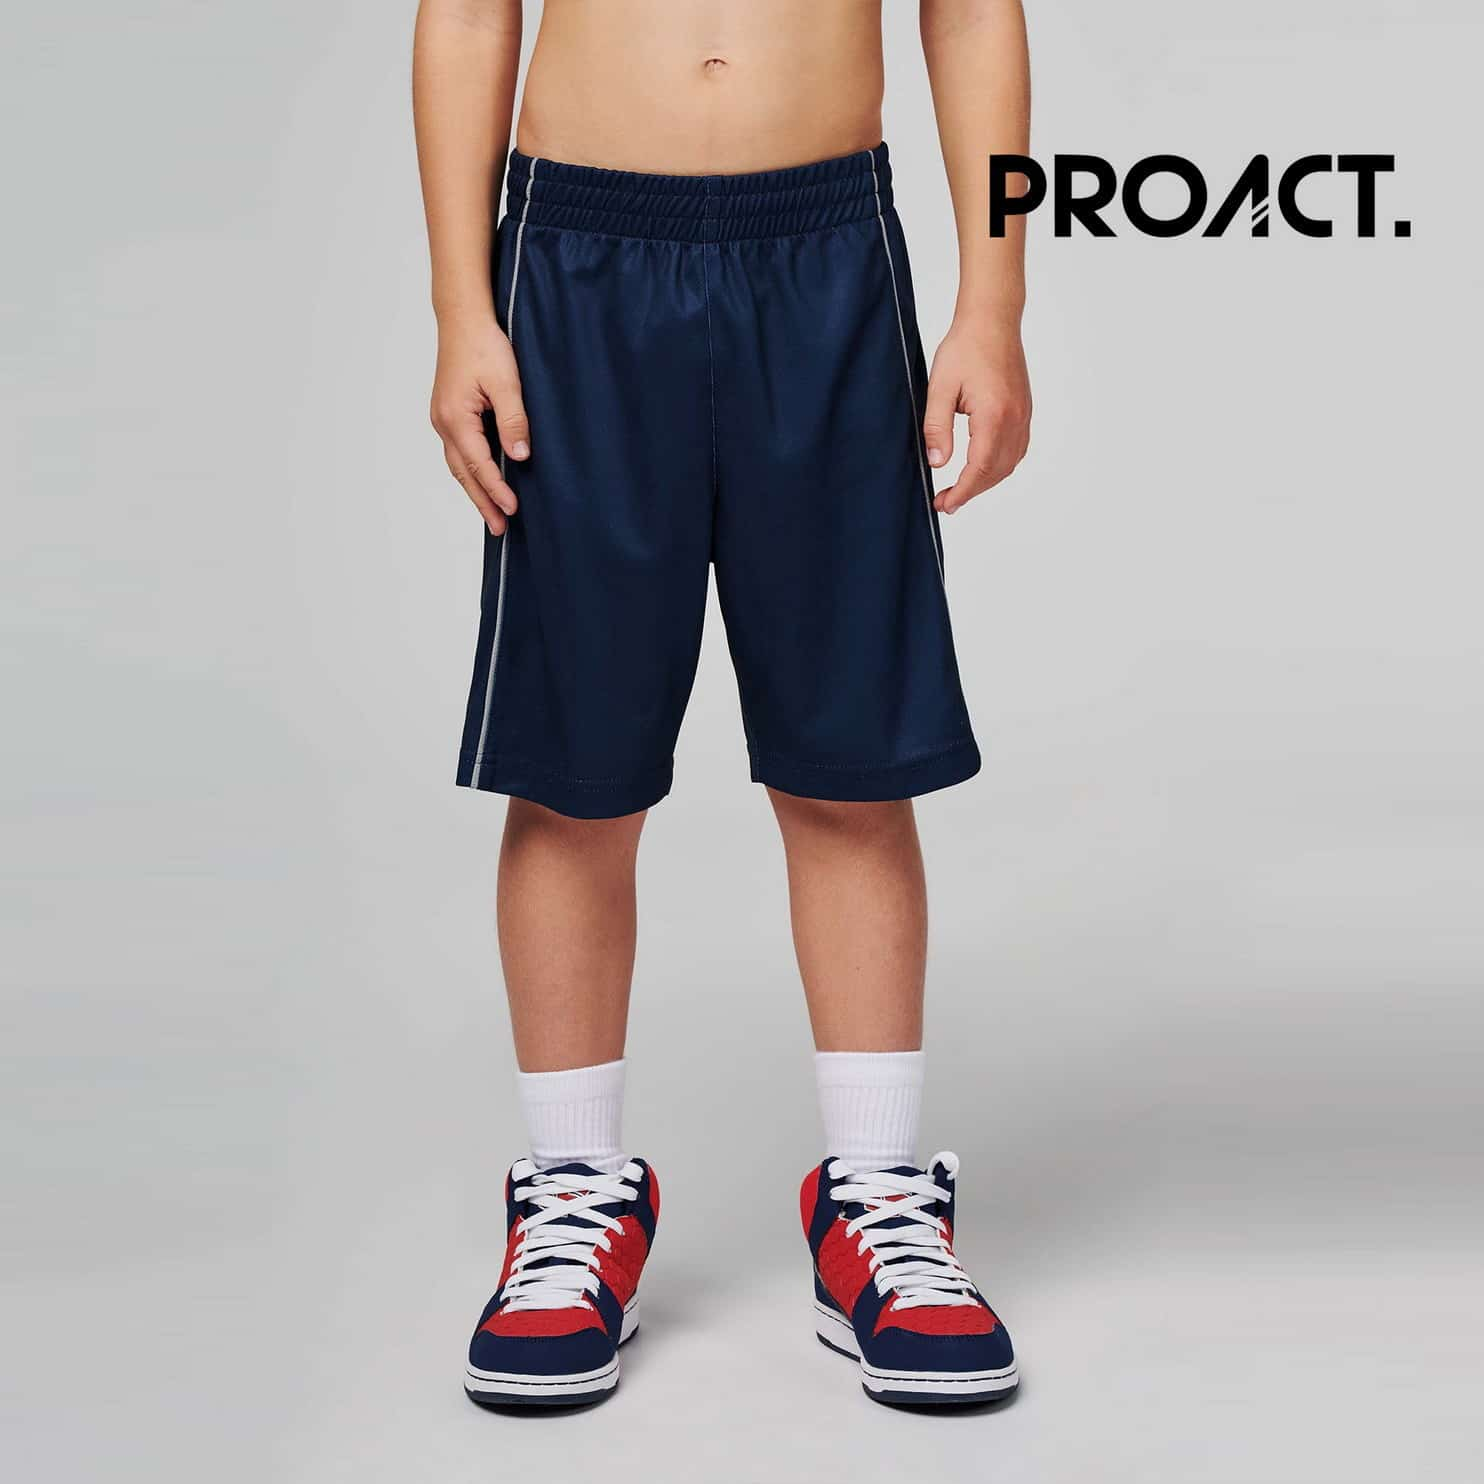 Bambino con pantaloncini da basket blu con tessuto ed asciugatura rapida